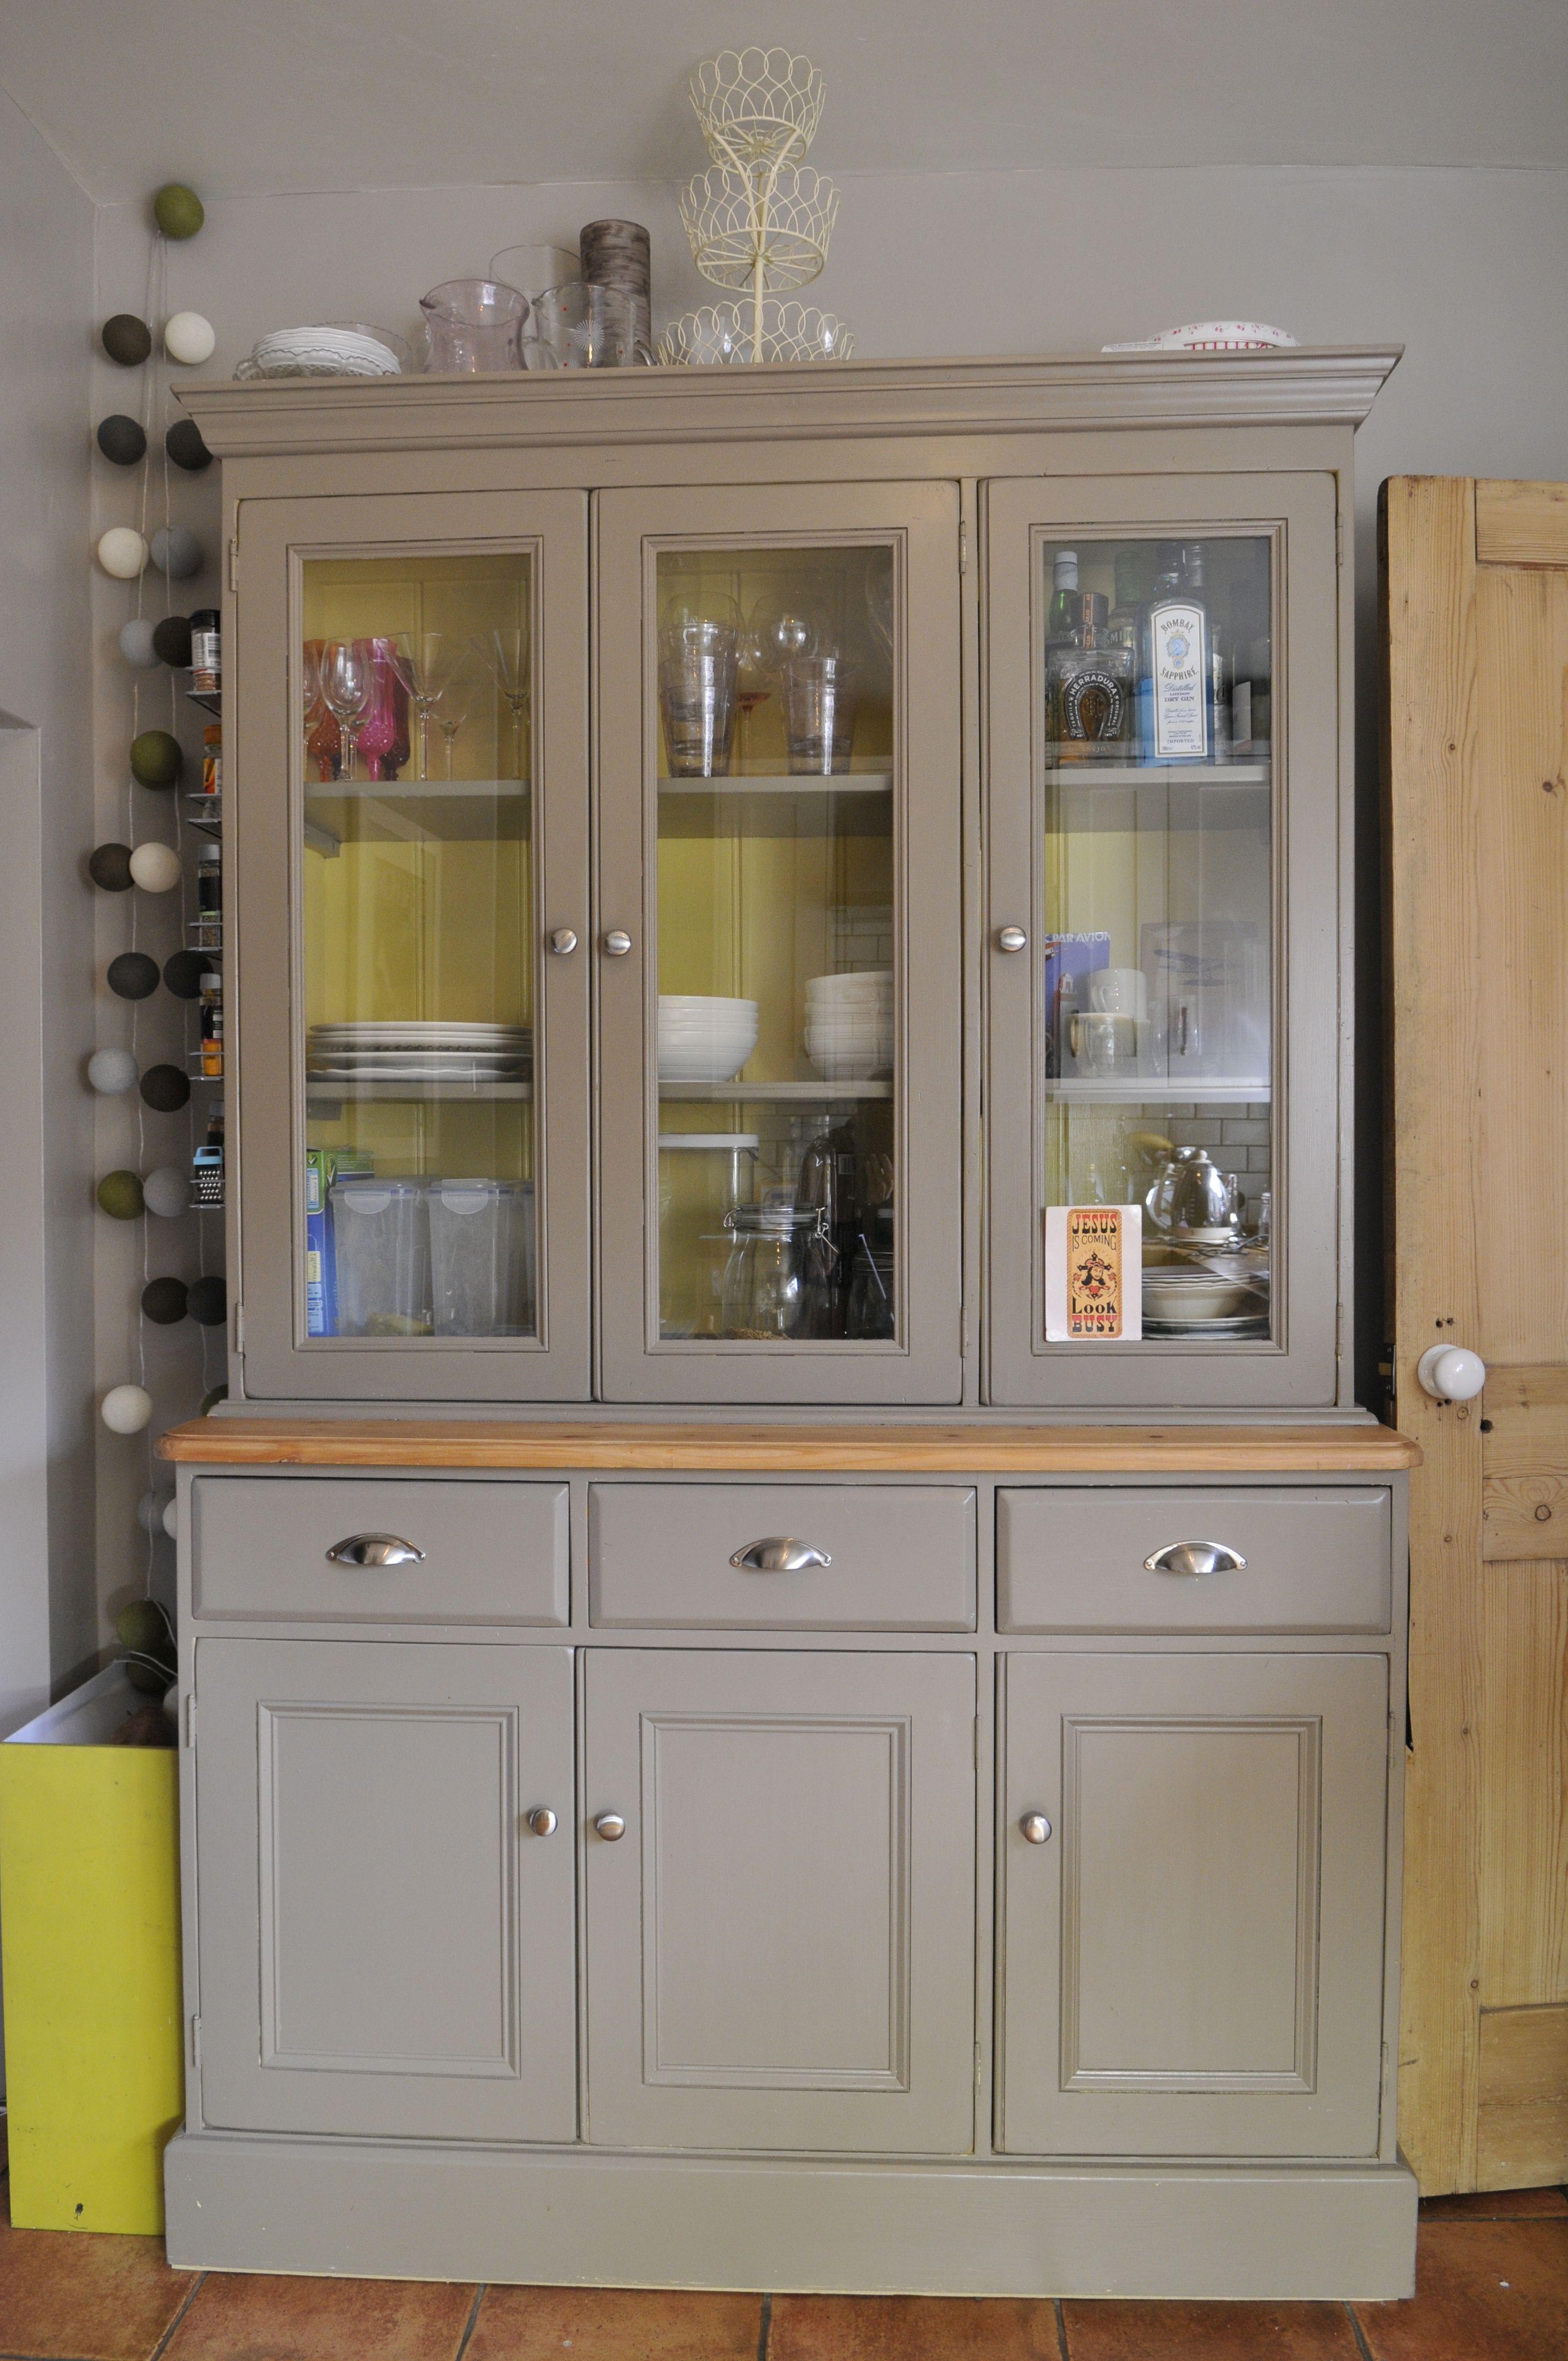 painted welsh dresser - Google Search | Furniture faves | Pinterest ...